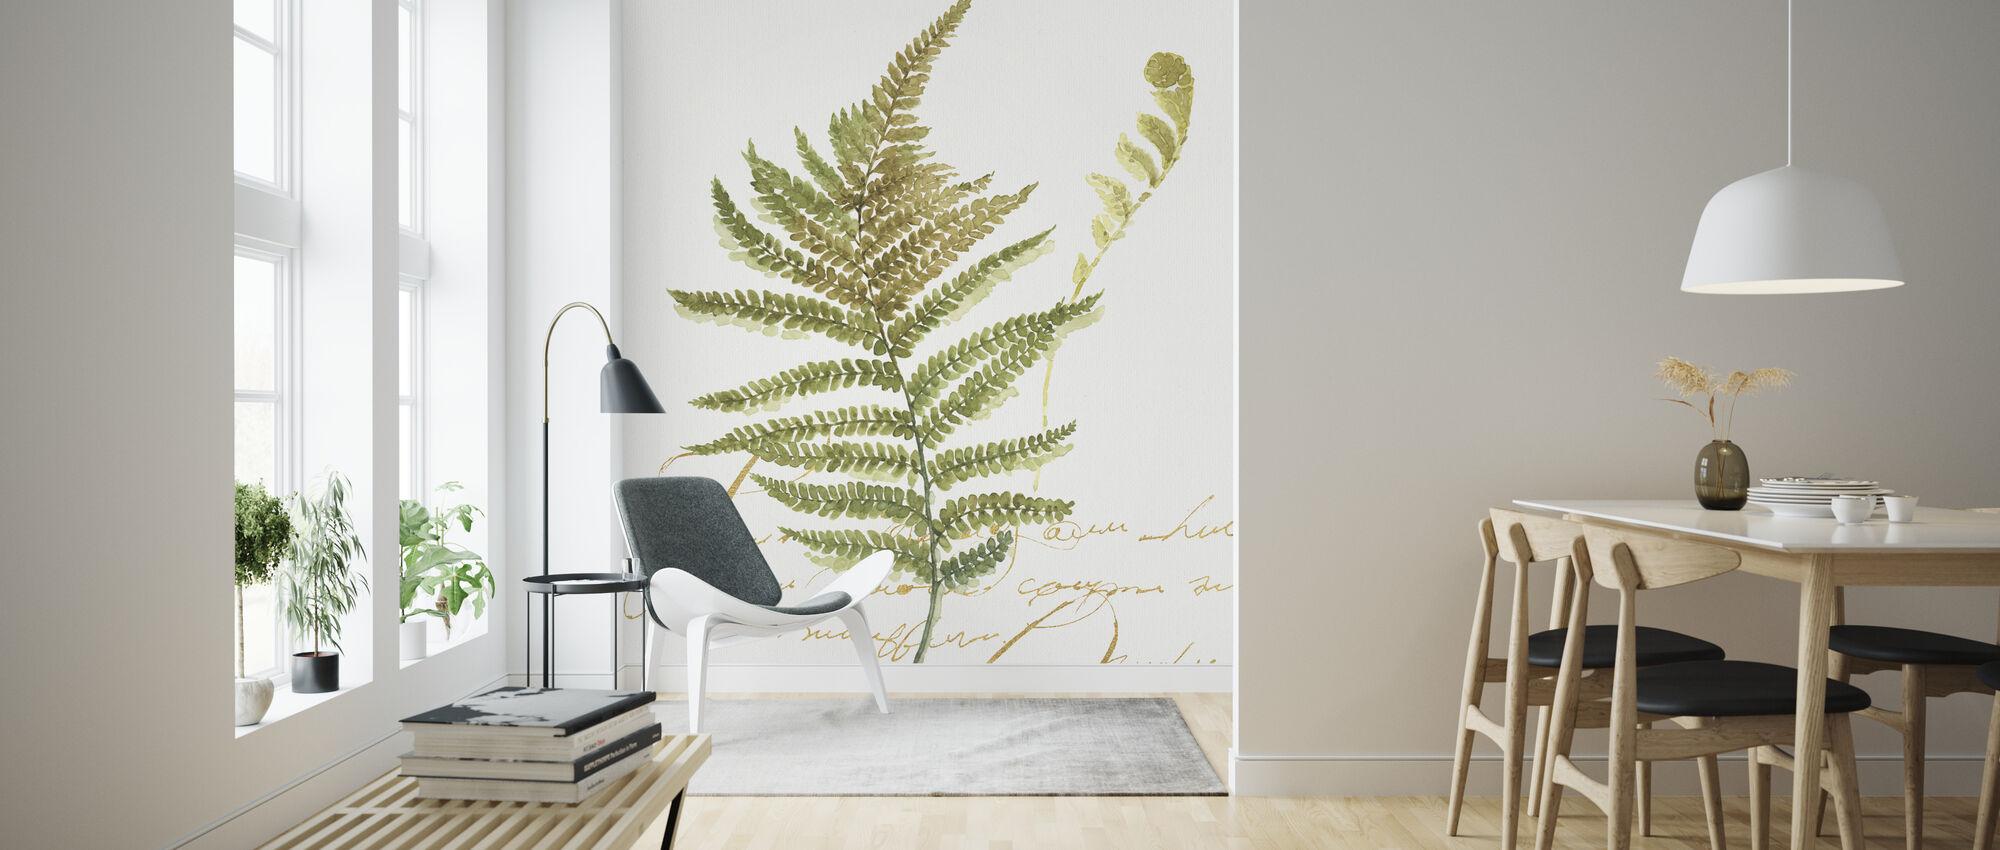 Aquarell Farn - Tapete - Wohnzimmer